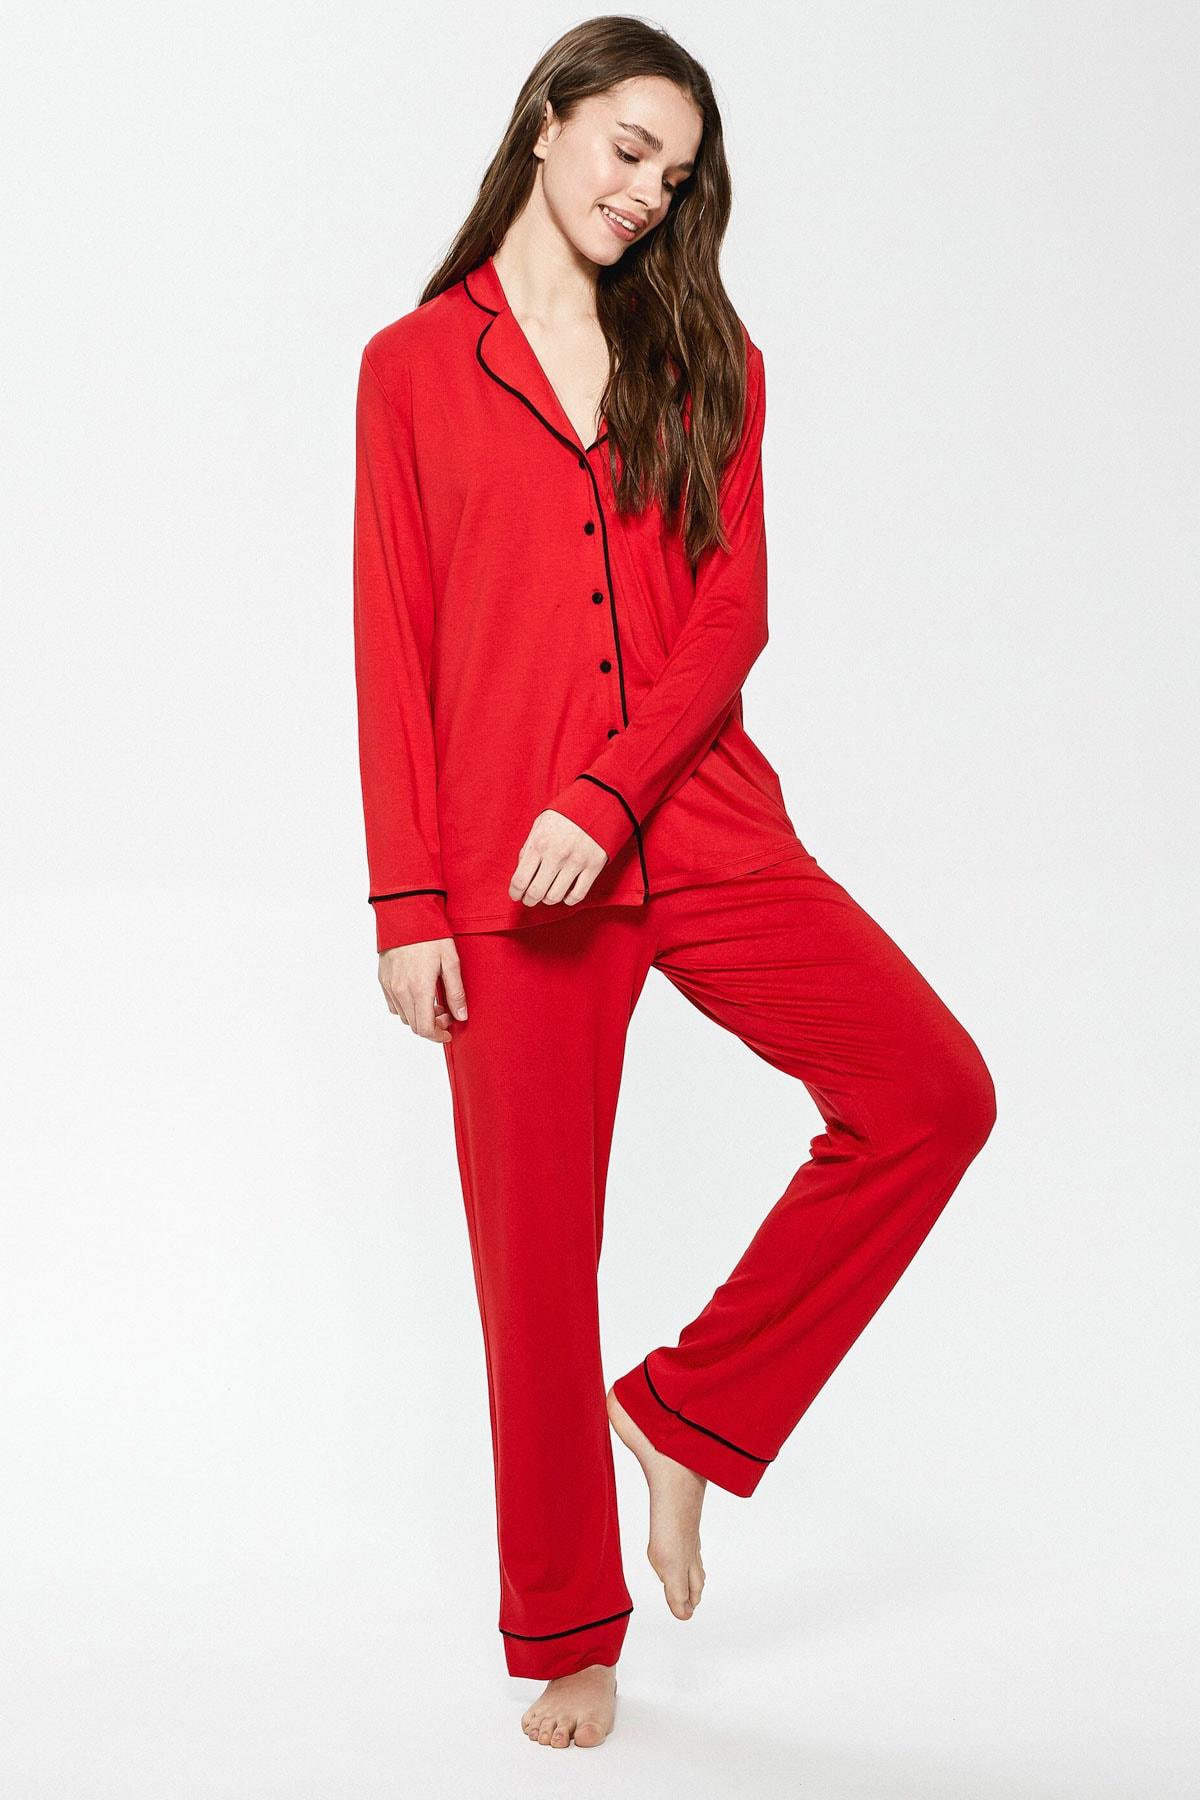 LC Waikiki Kadın Canlı Kırmızı LCW DREAM Pijama Takım 1